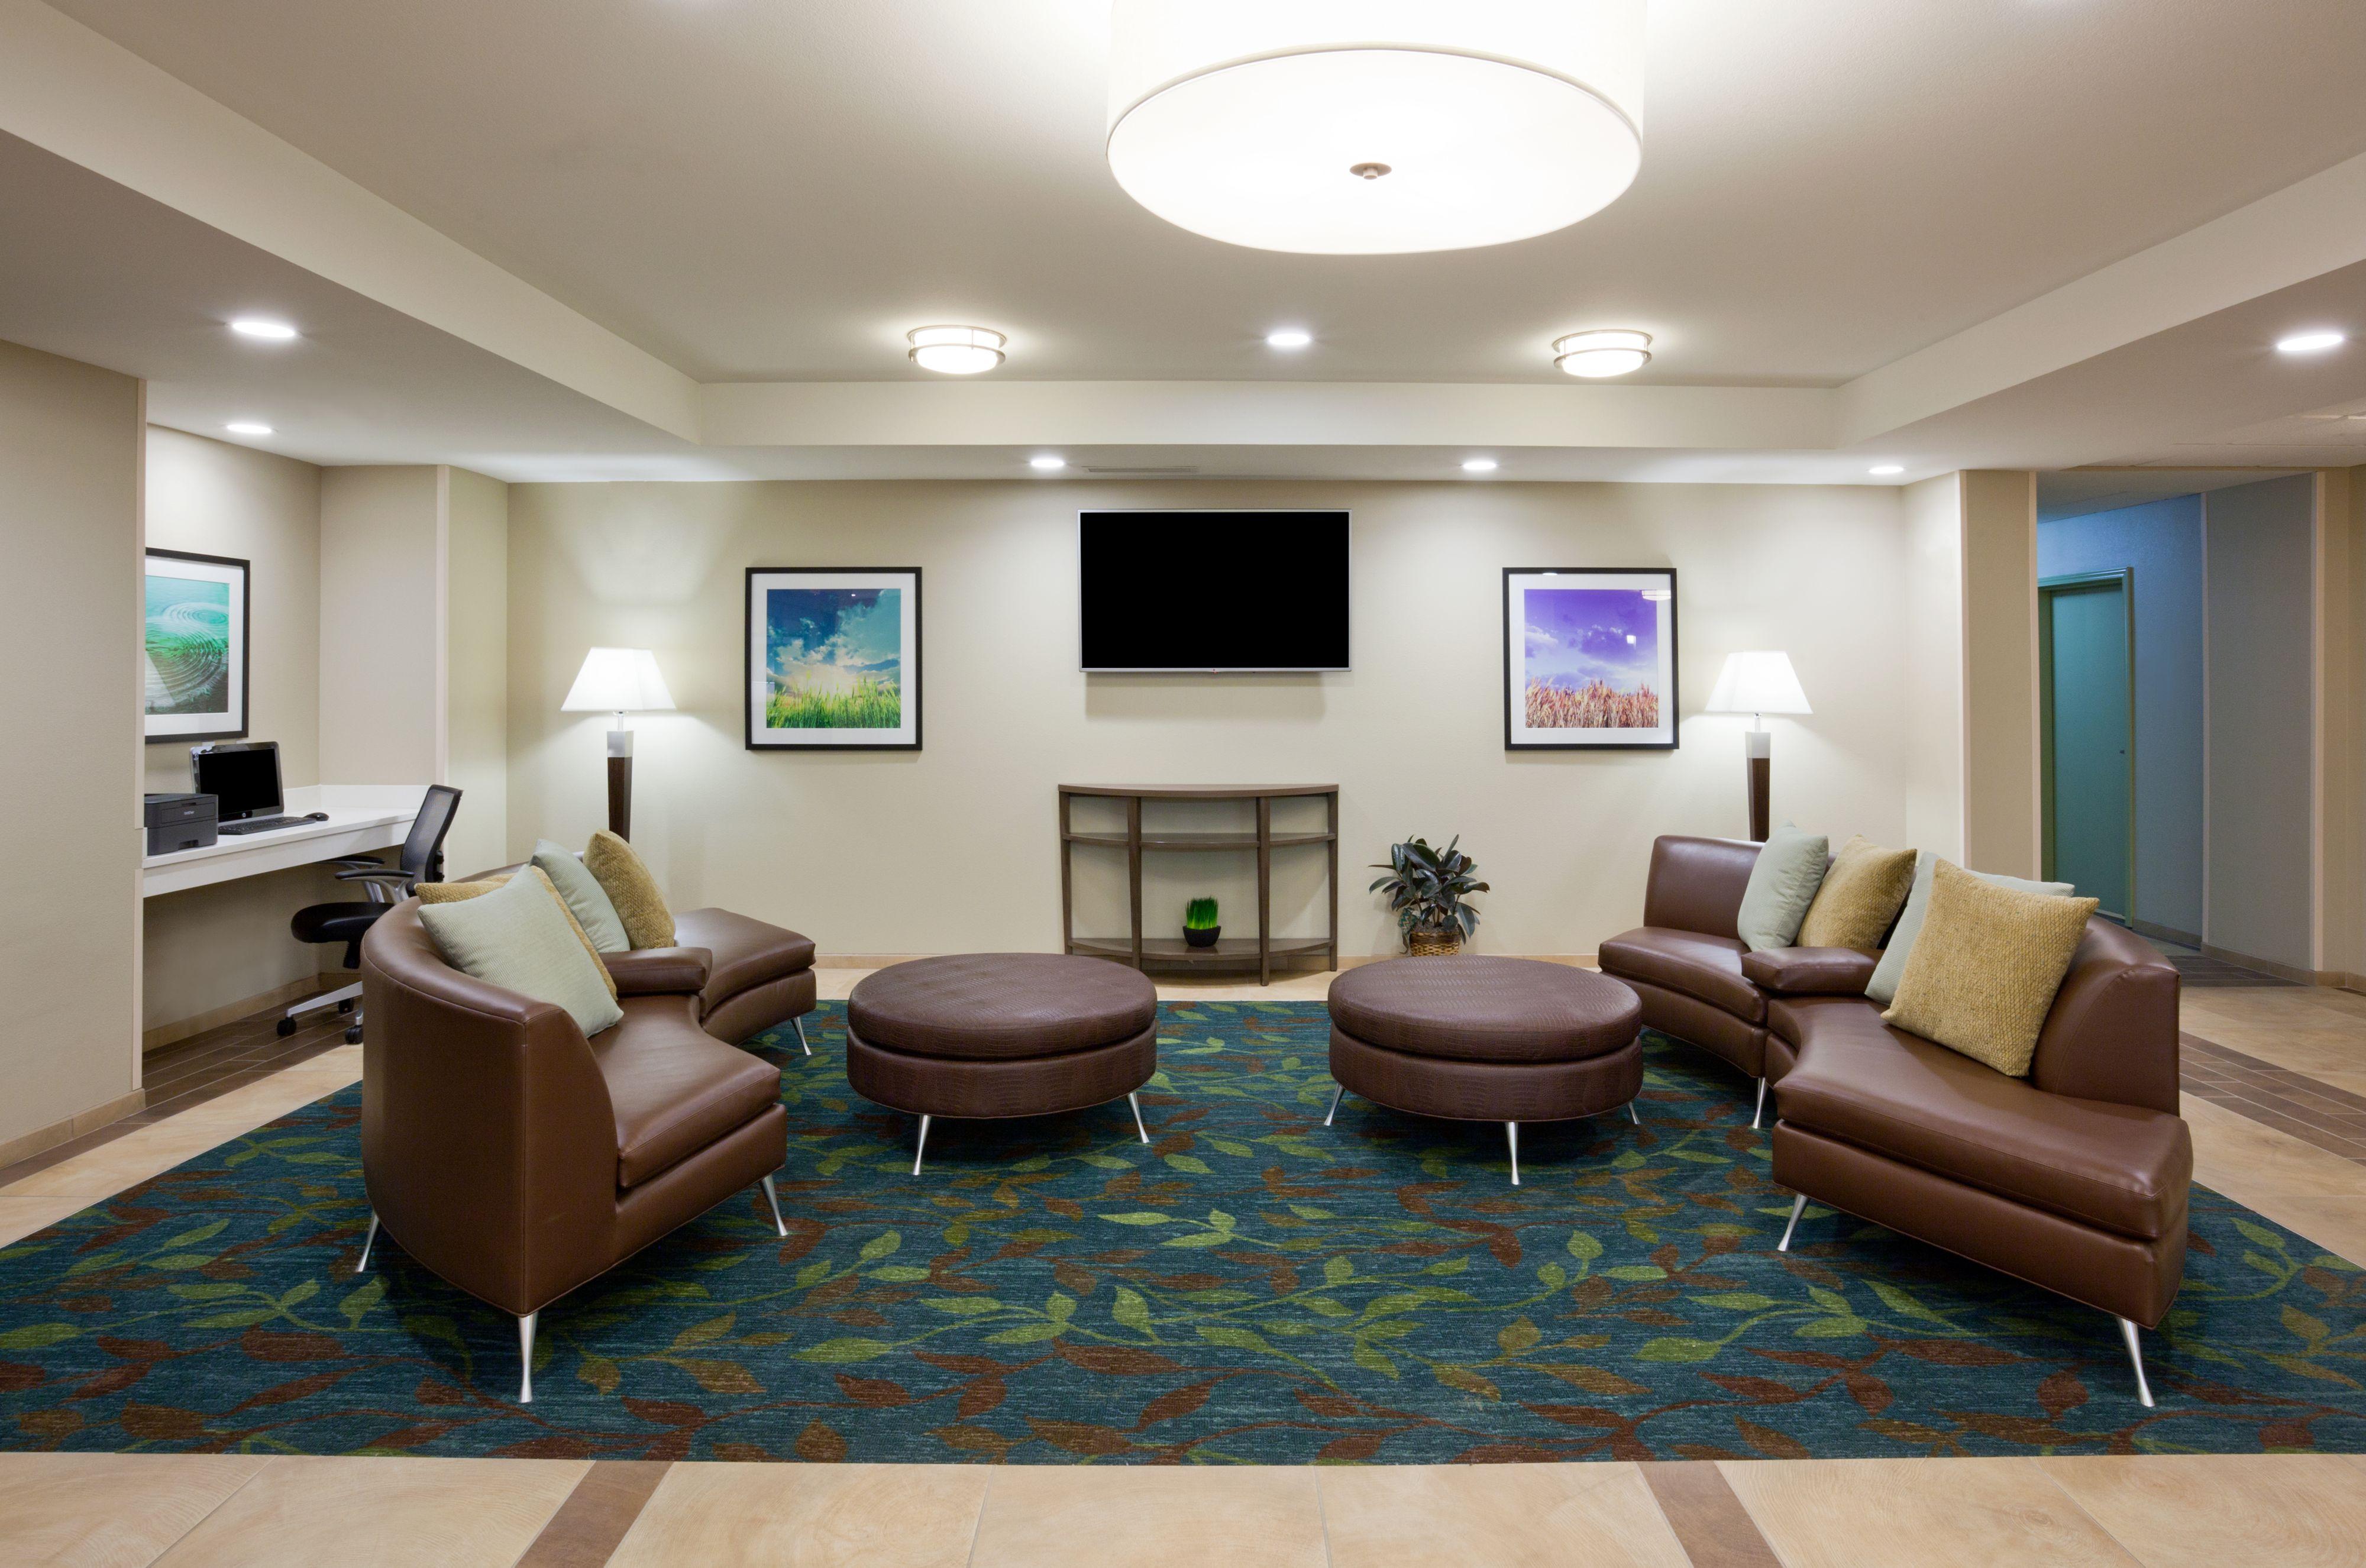 Candlewood Suites Longmont image 4